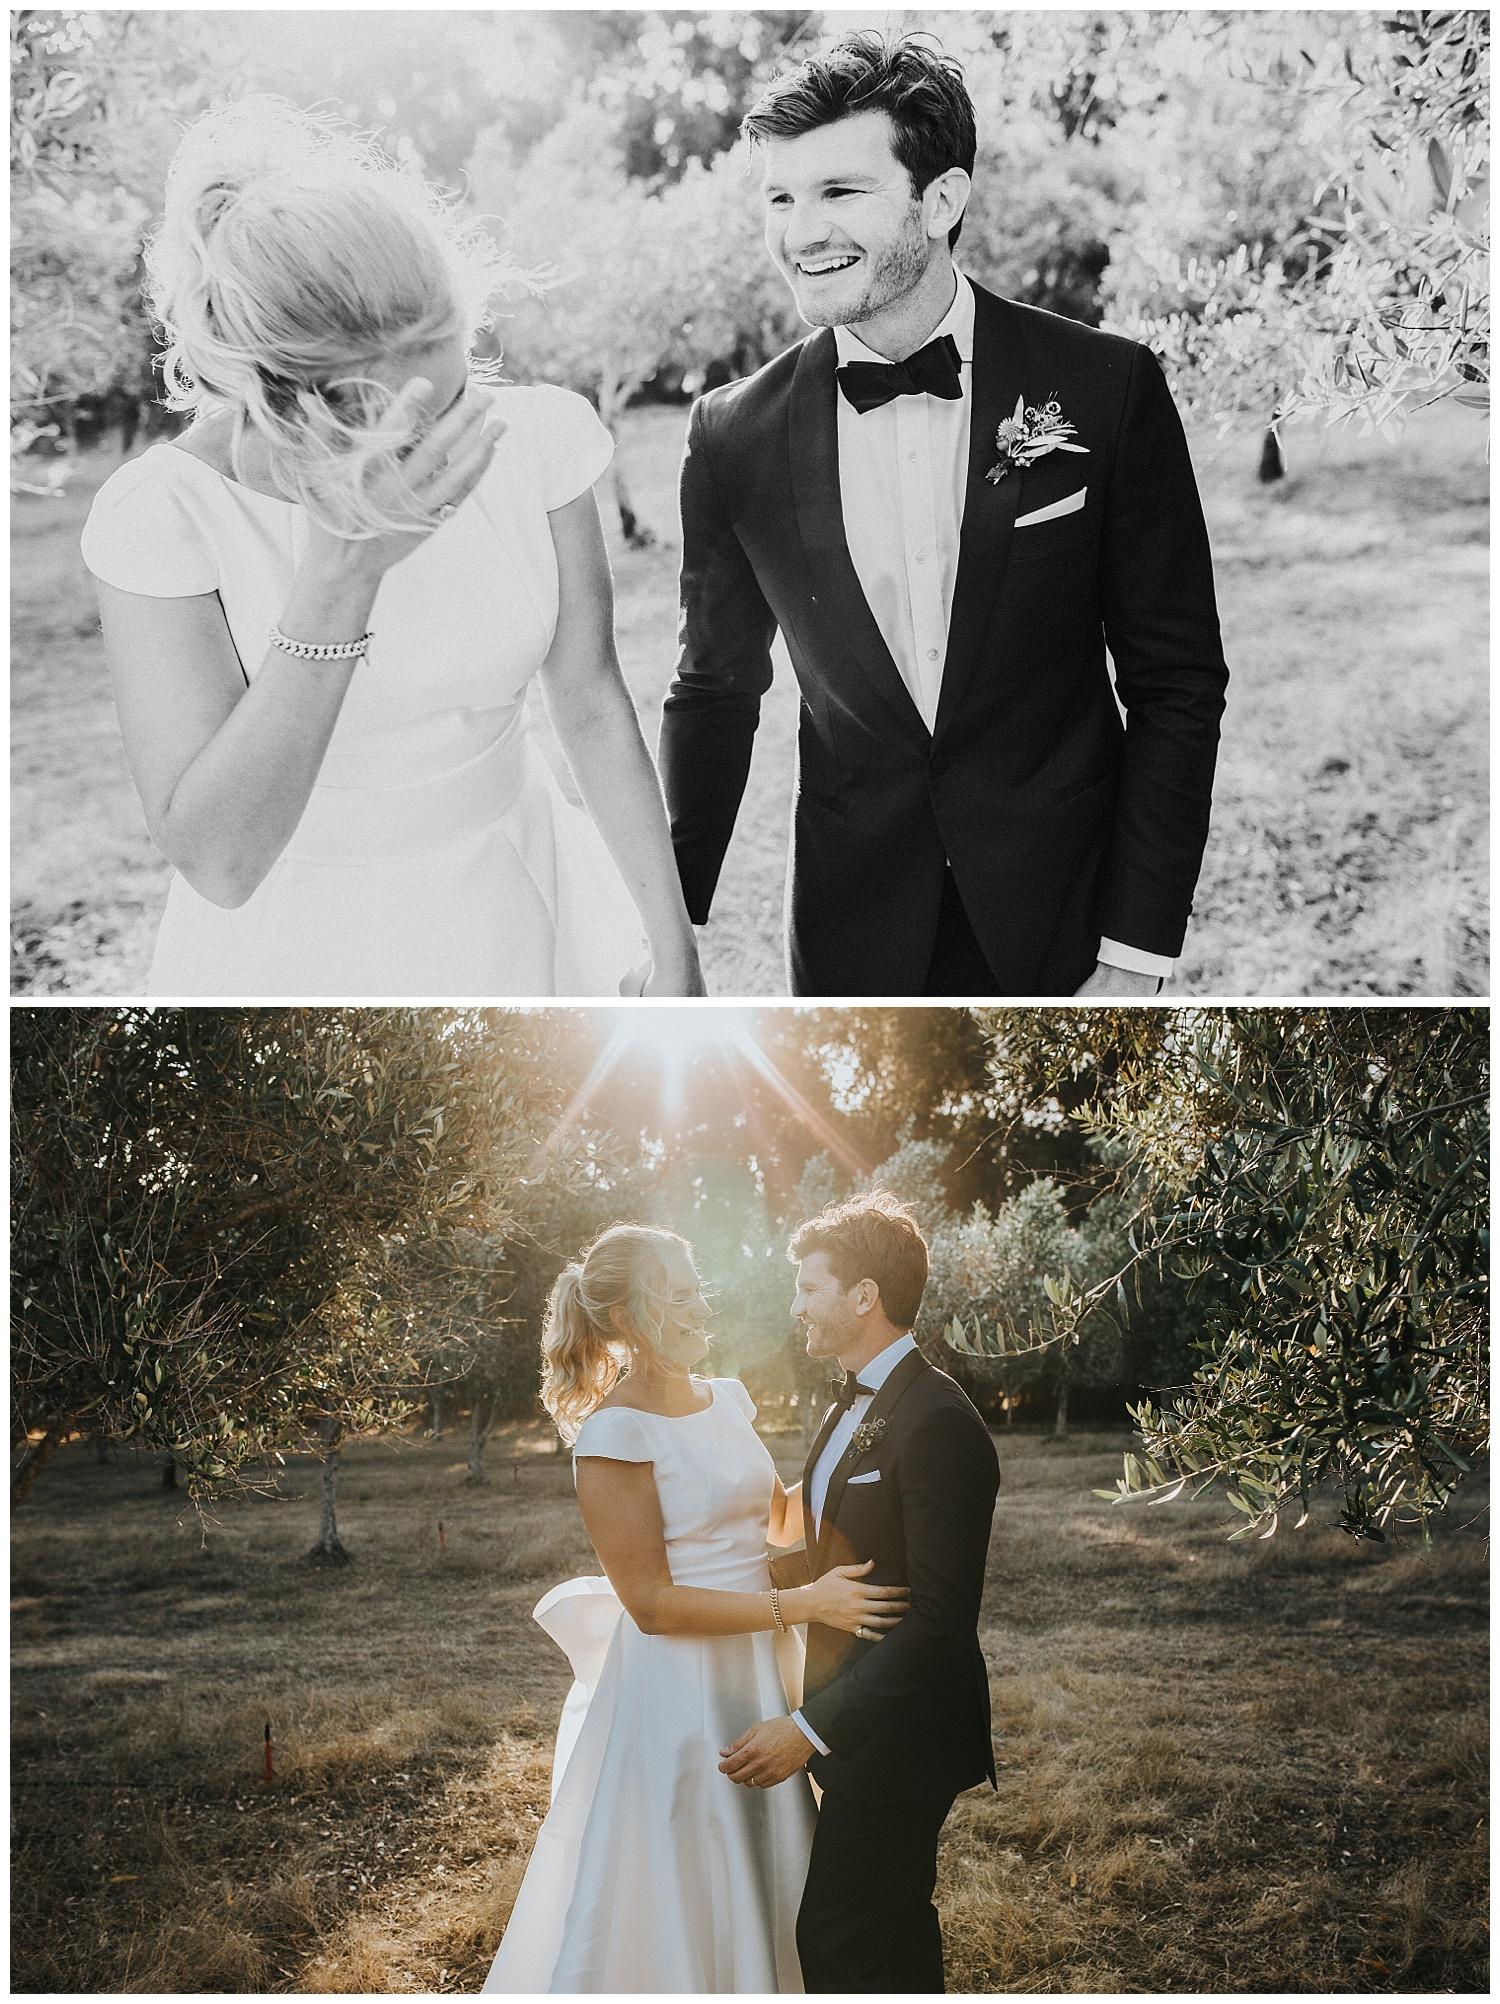 olio_bello_wedding_keeper_creative_022.JPG